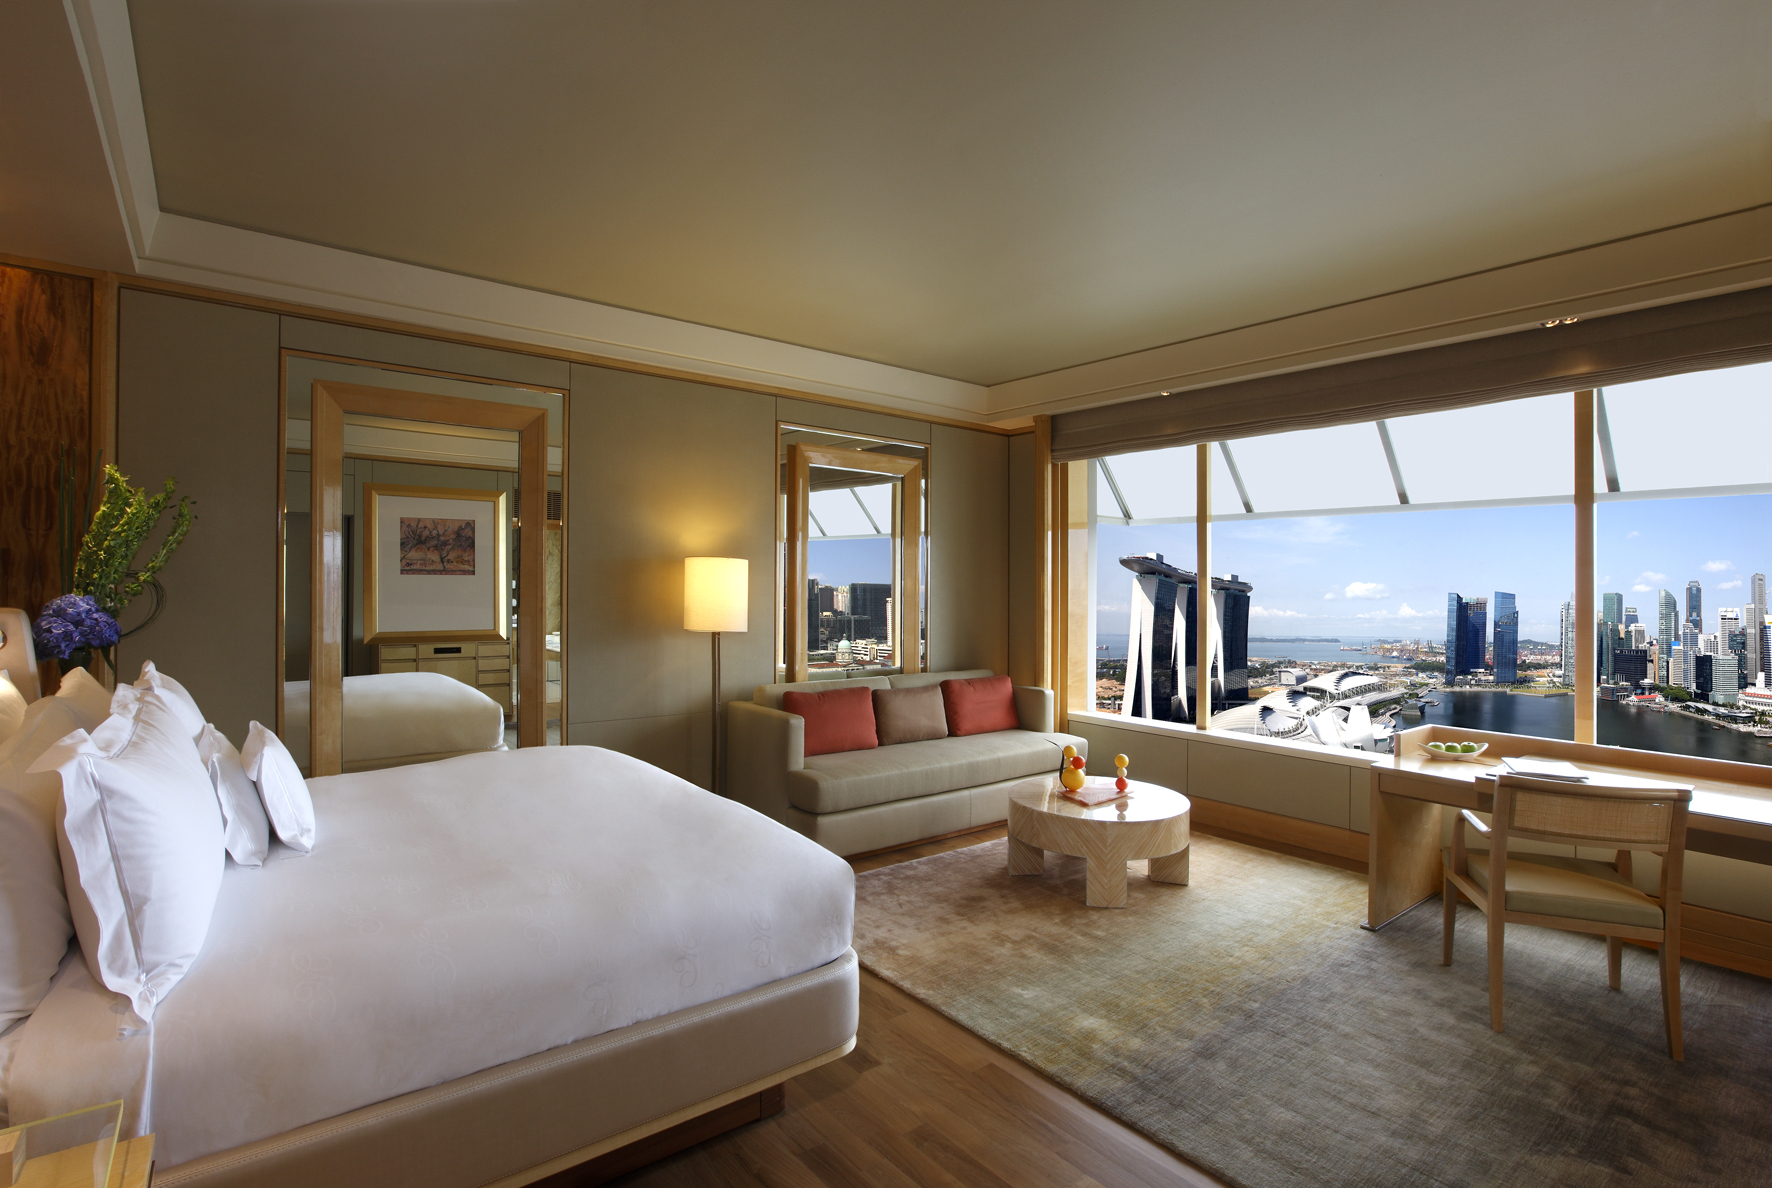 Ritz Carlton Rooms For Rent